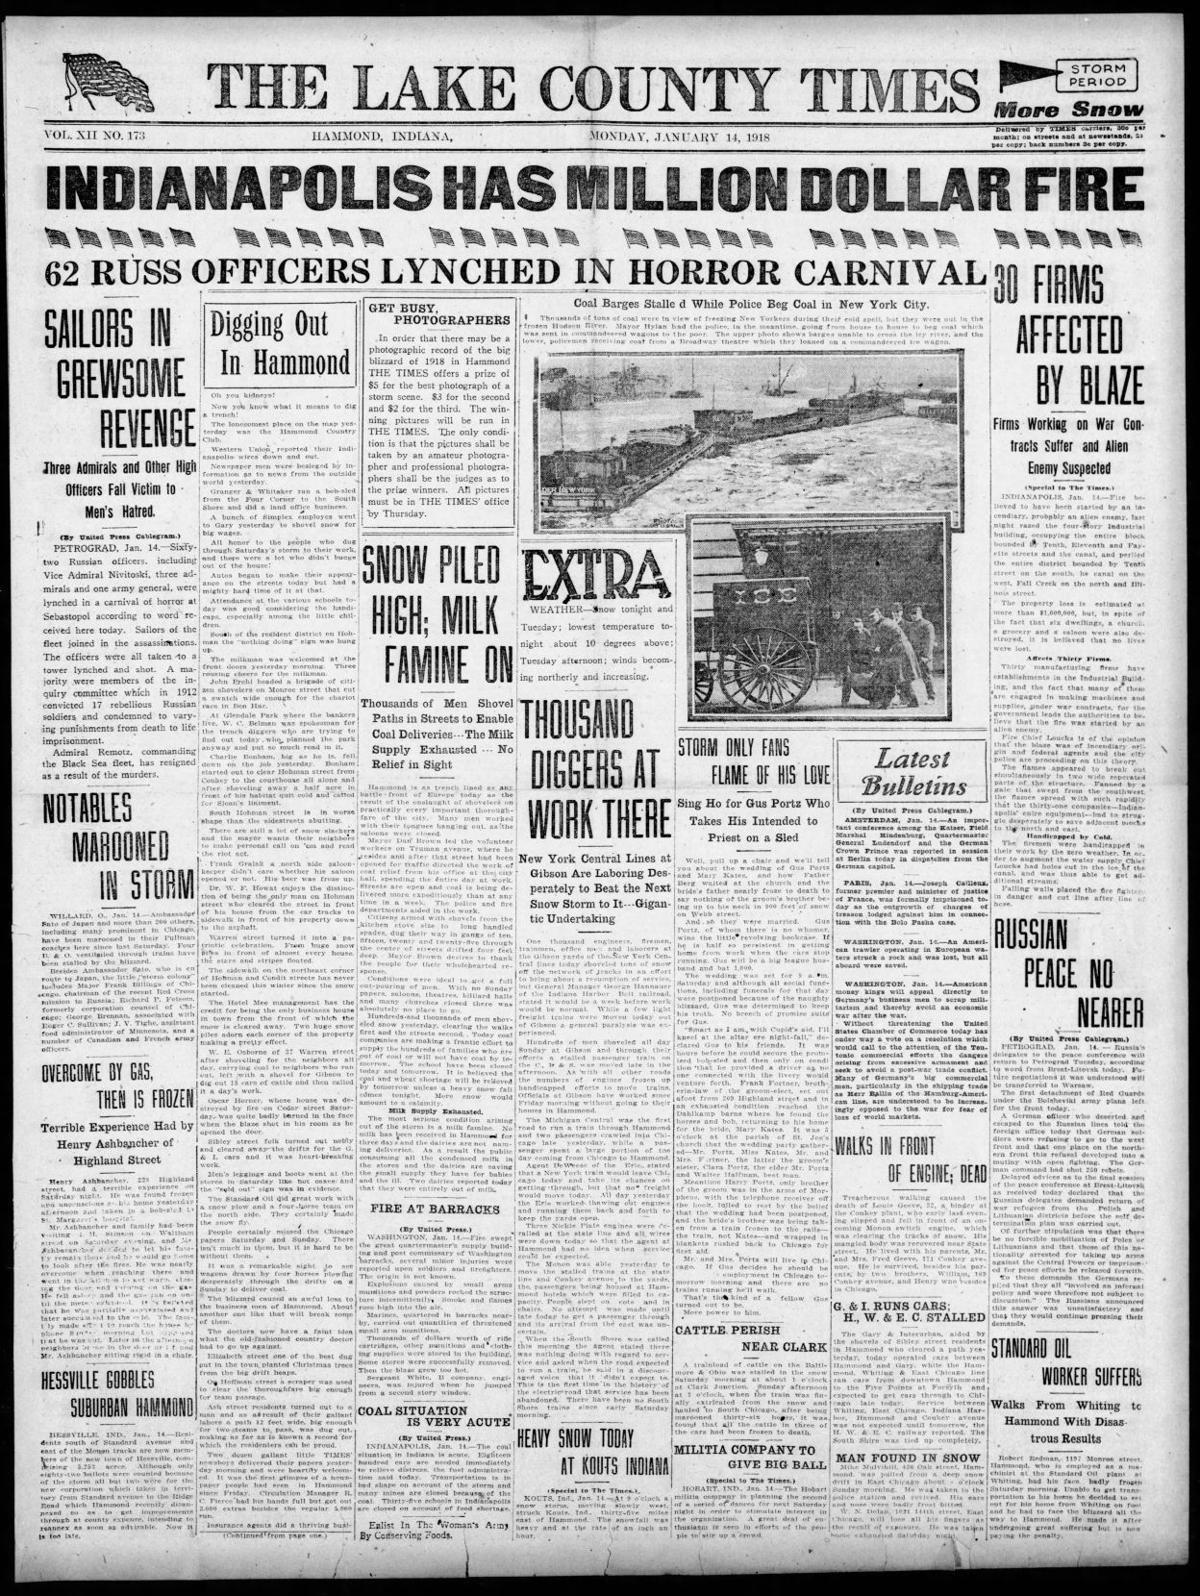 Jan. 14, 1918: Indianapolis Has Million Dollar Fire